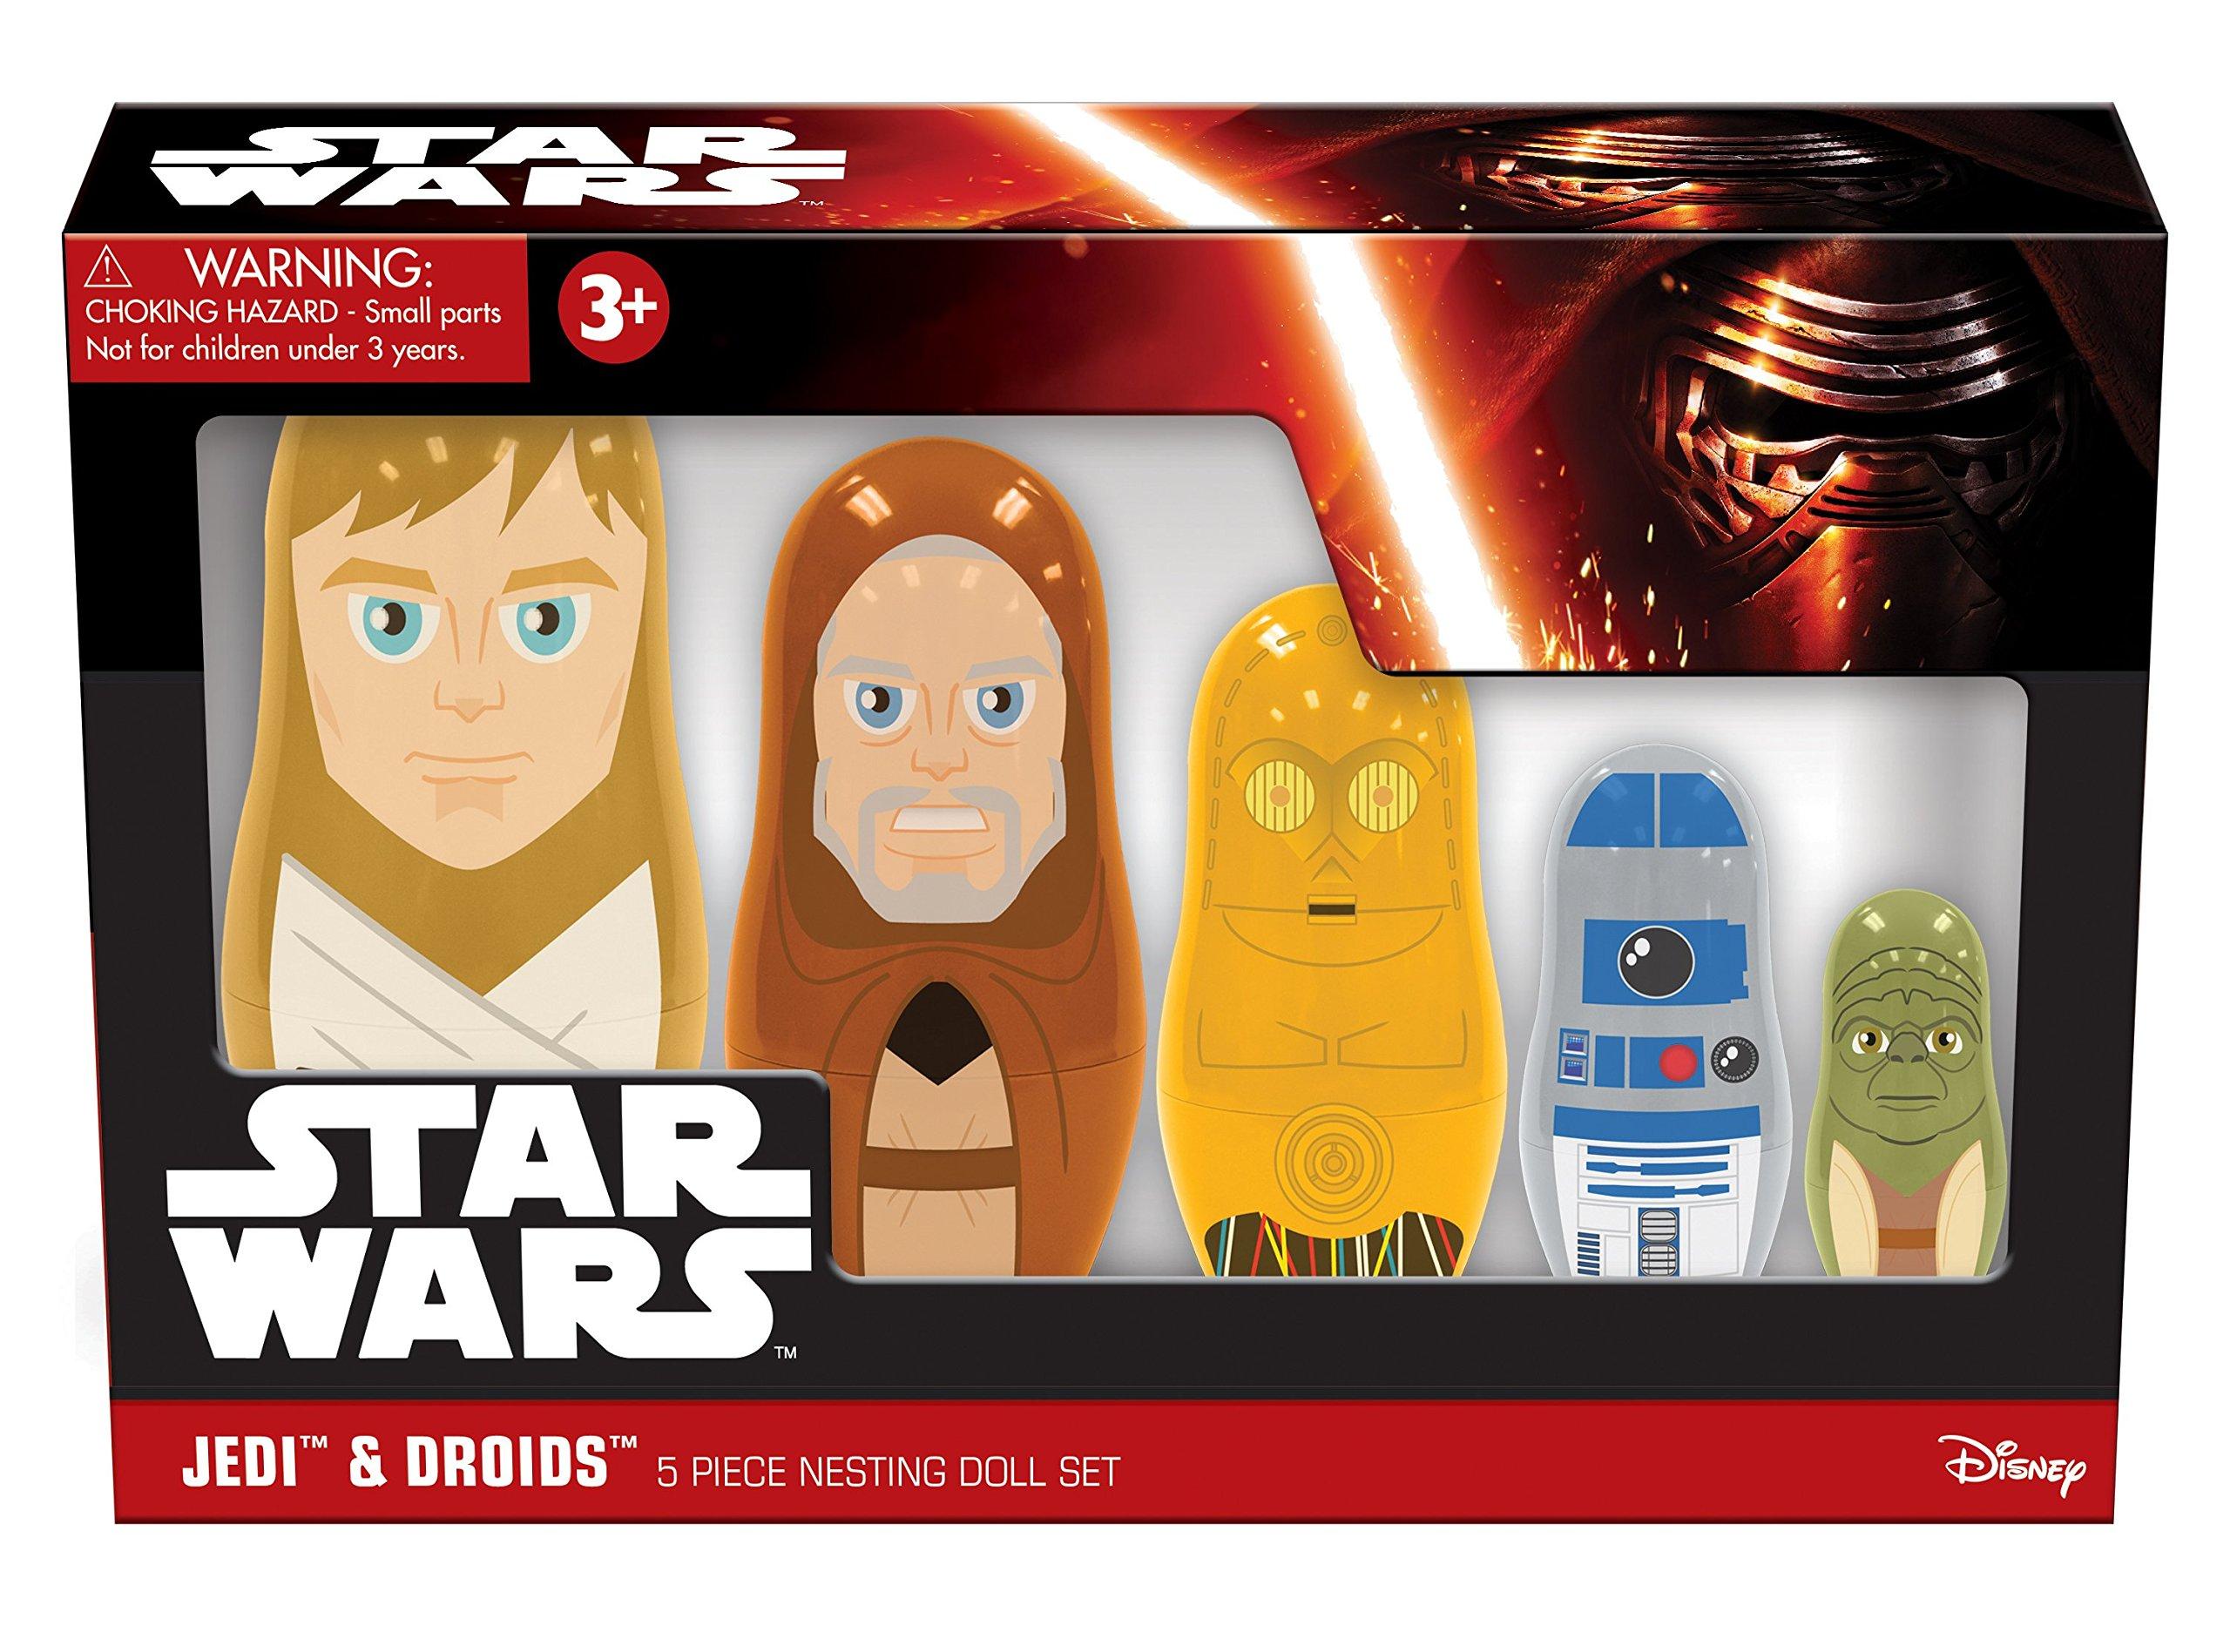 PPW Star Wars Nesting Dolls Jedi and Droids Toy by PPW